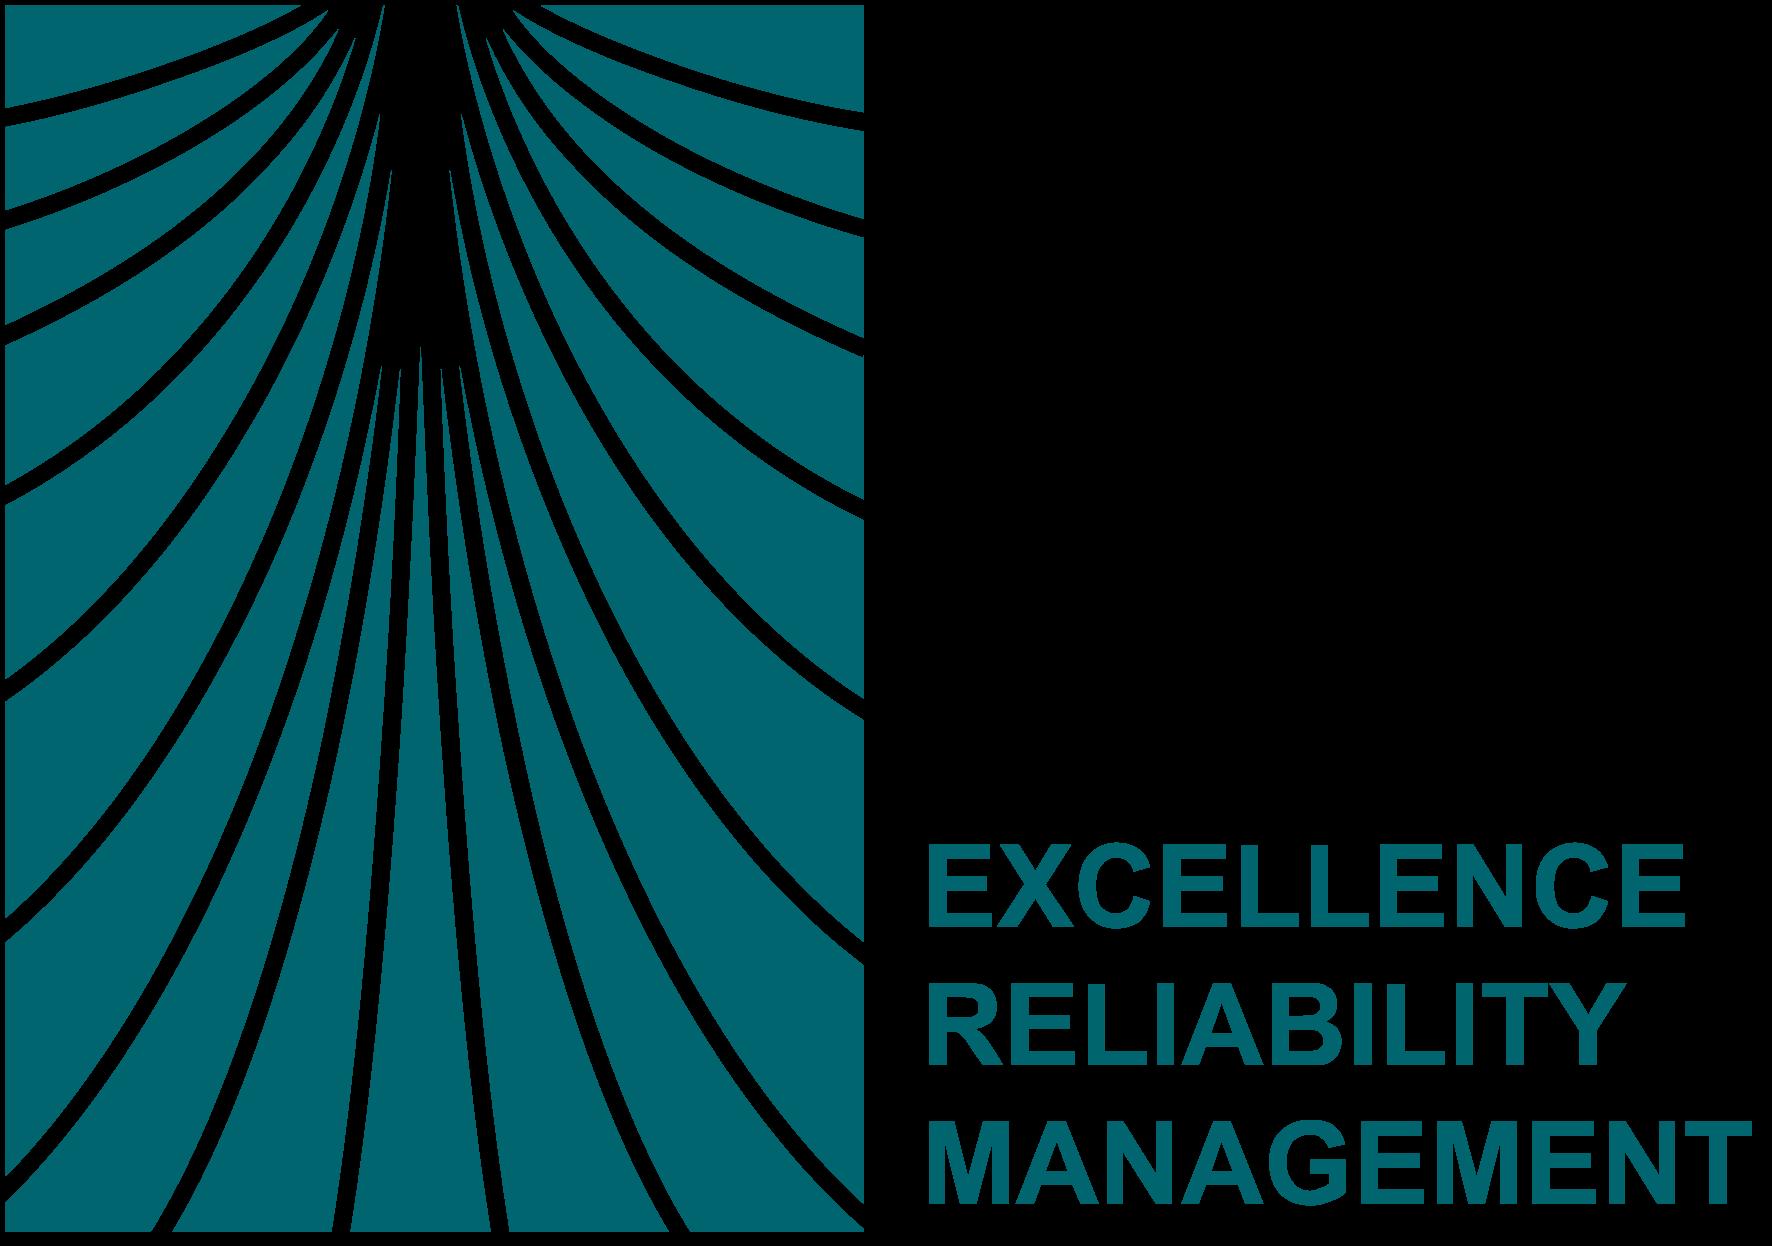 Excellence Consult & Services - Práticas Gerenciais